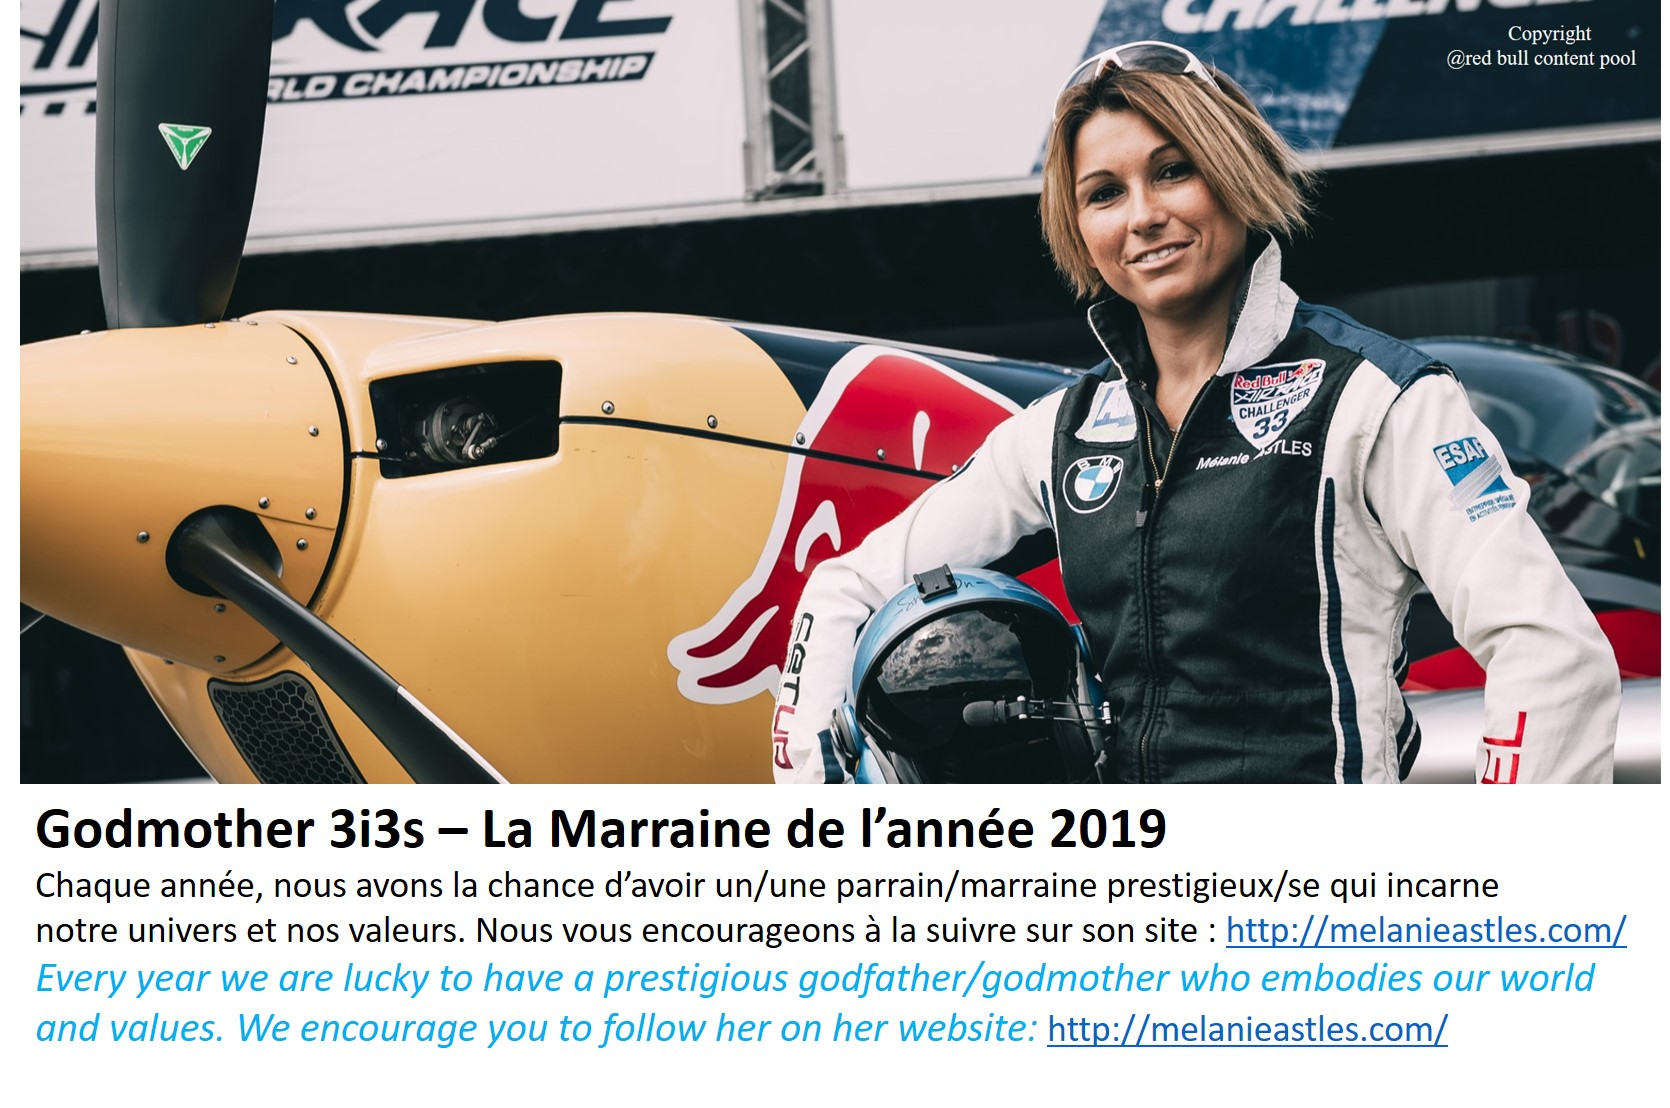 3i3s – MARRAINE / GODMOTHER: Mélanie ASTLES – 2019